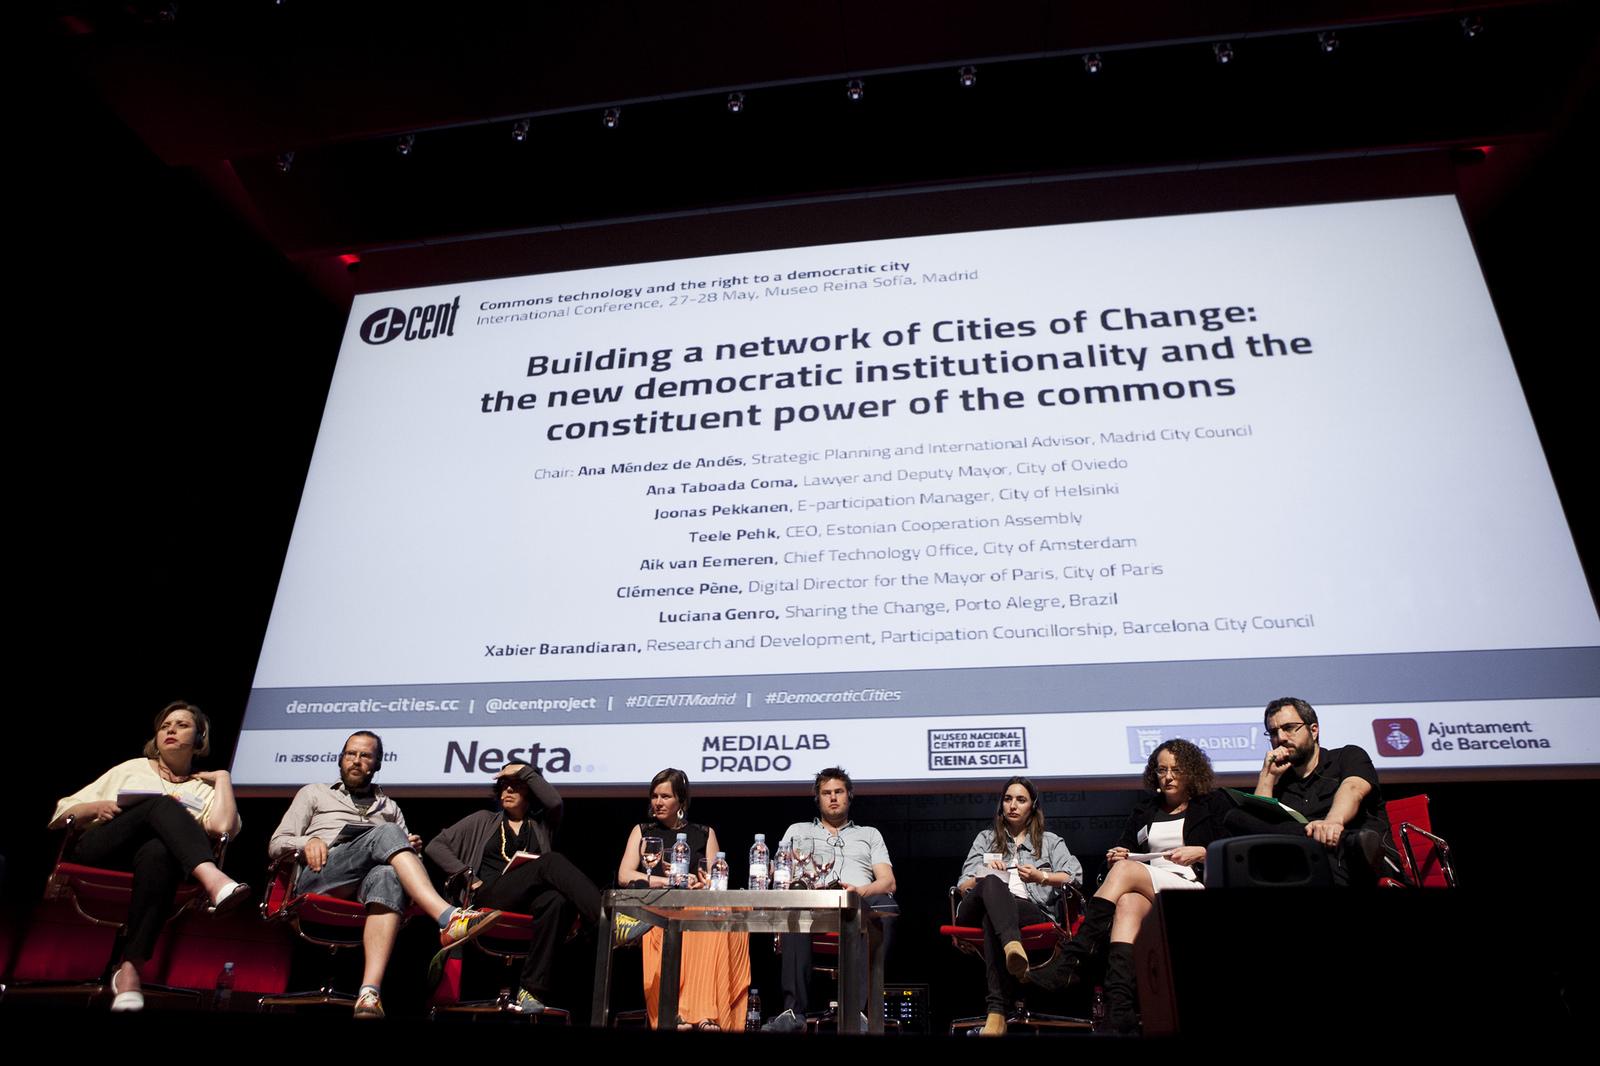 Digital democracy – where to next?